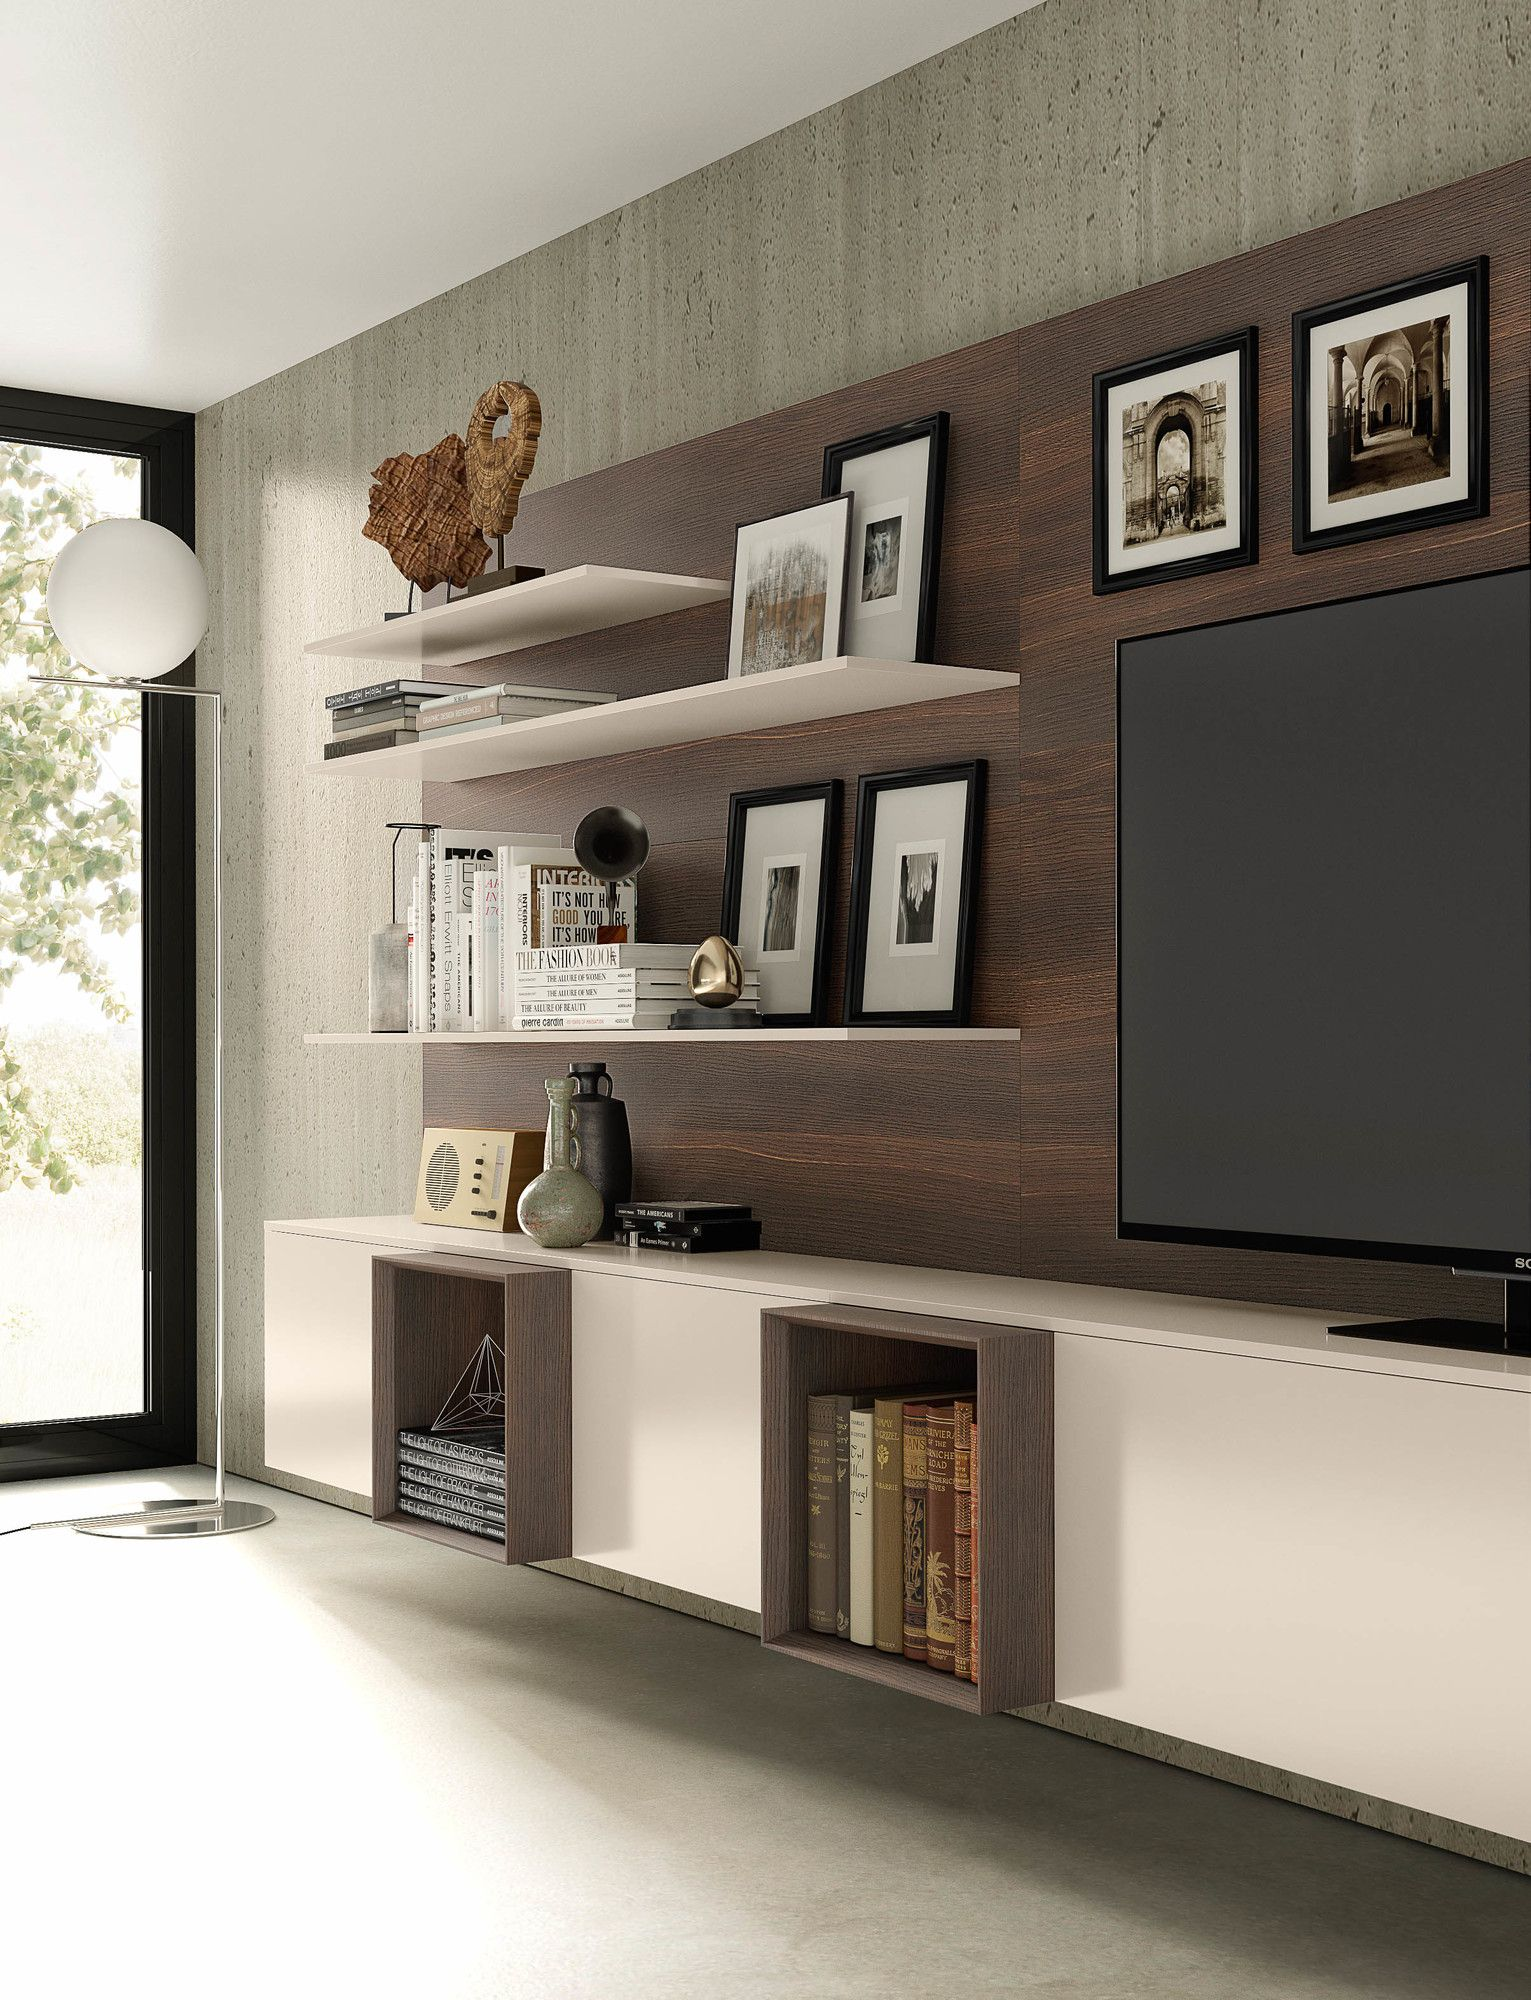 More ideas below diy pallet entertainment center built in plans floating decor rustic also best design for living room rh pinterest